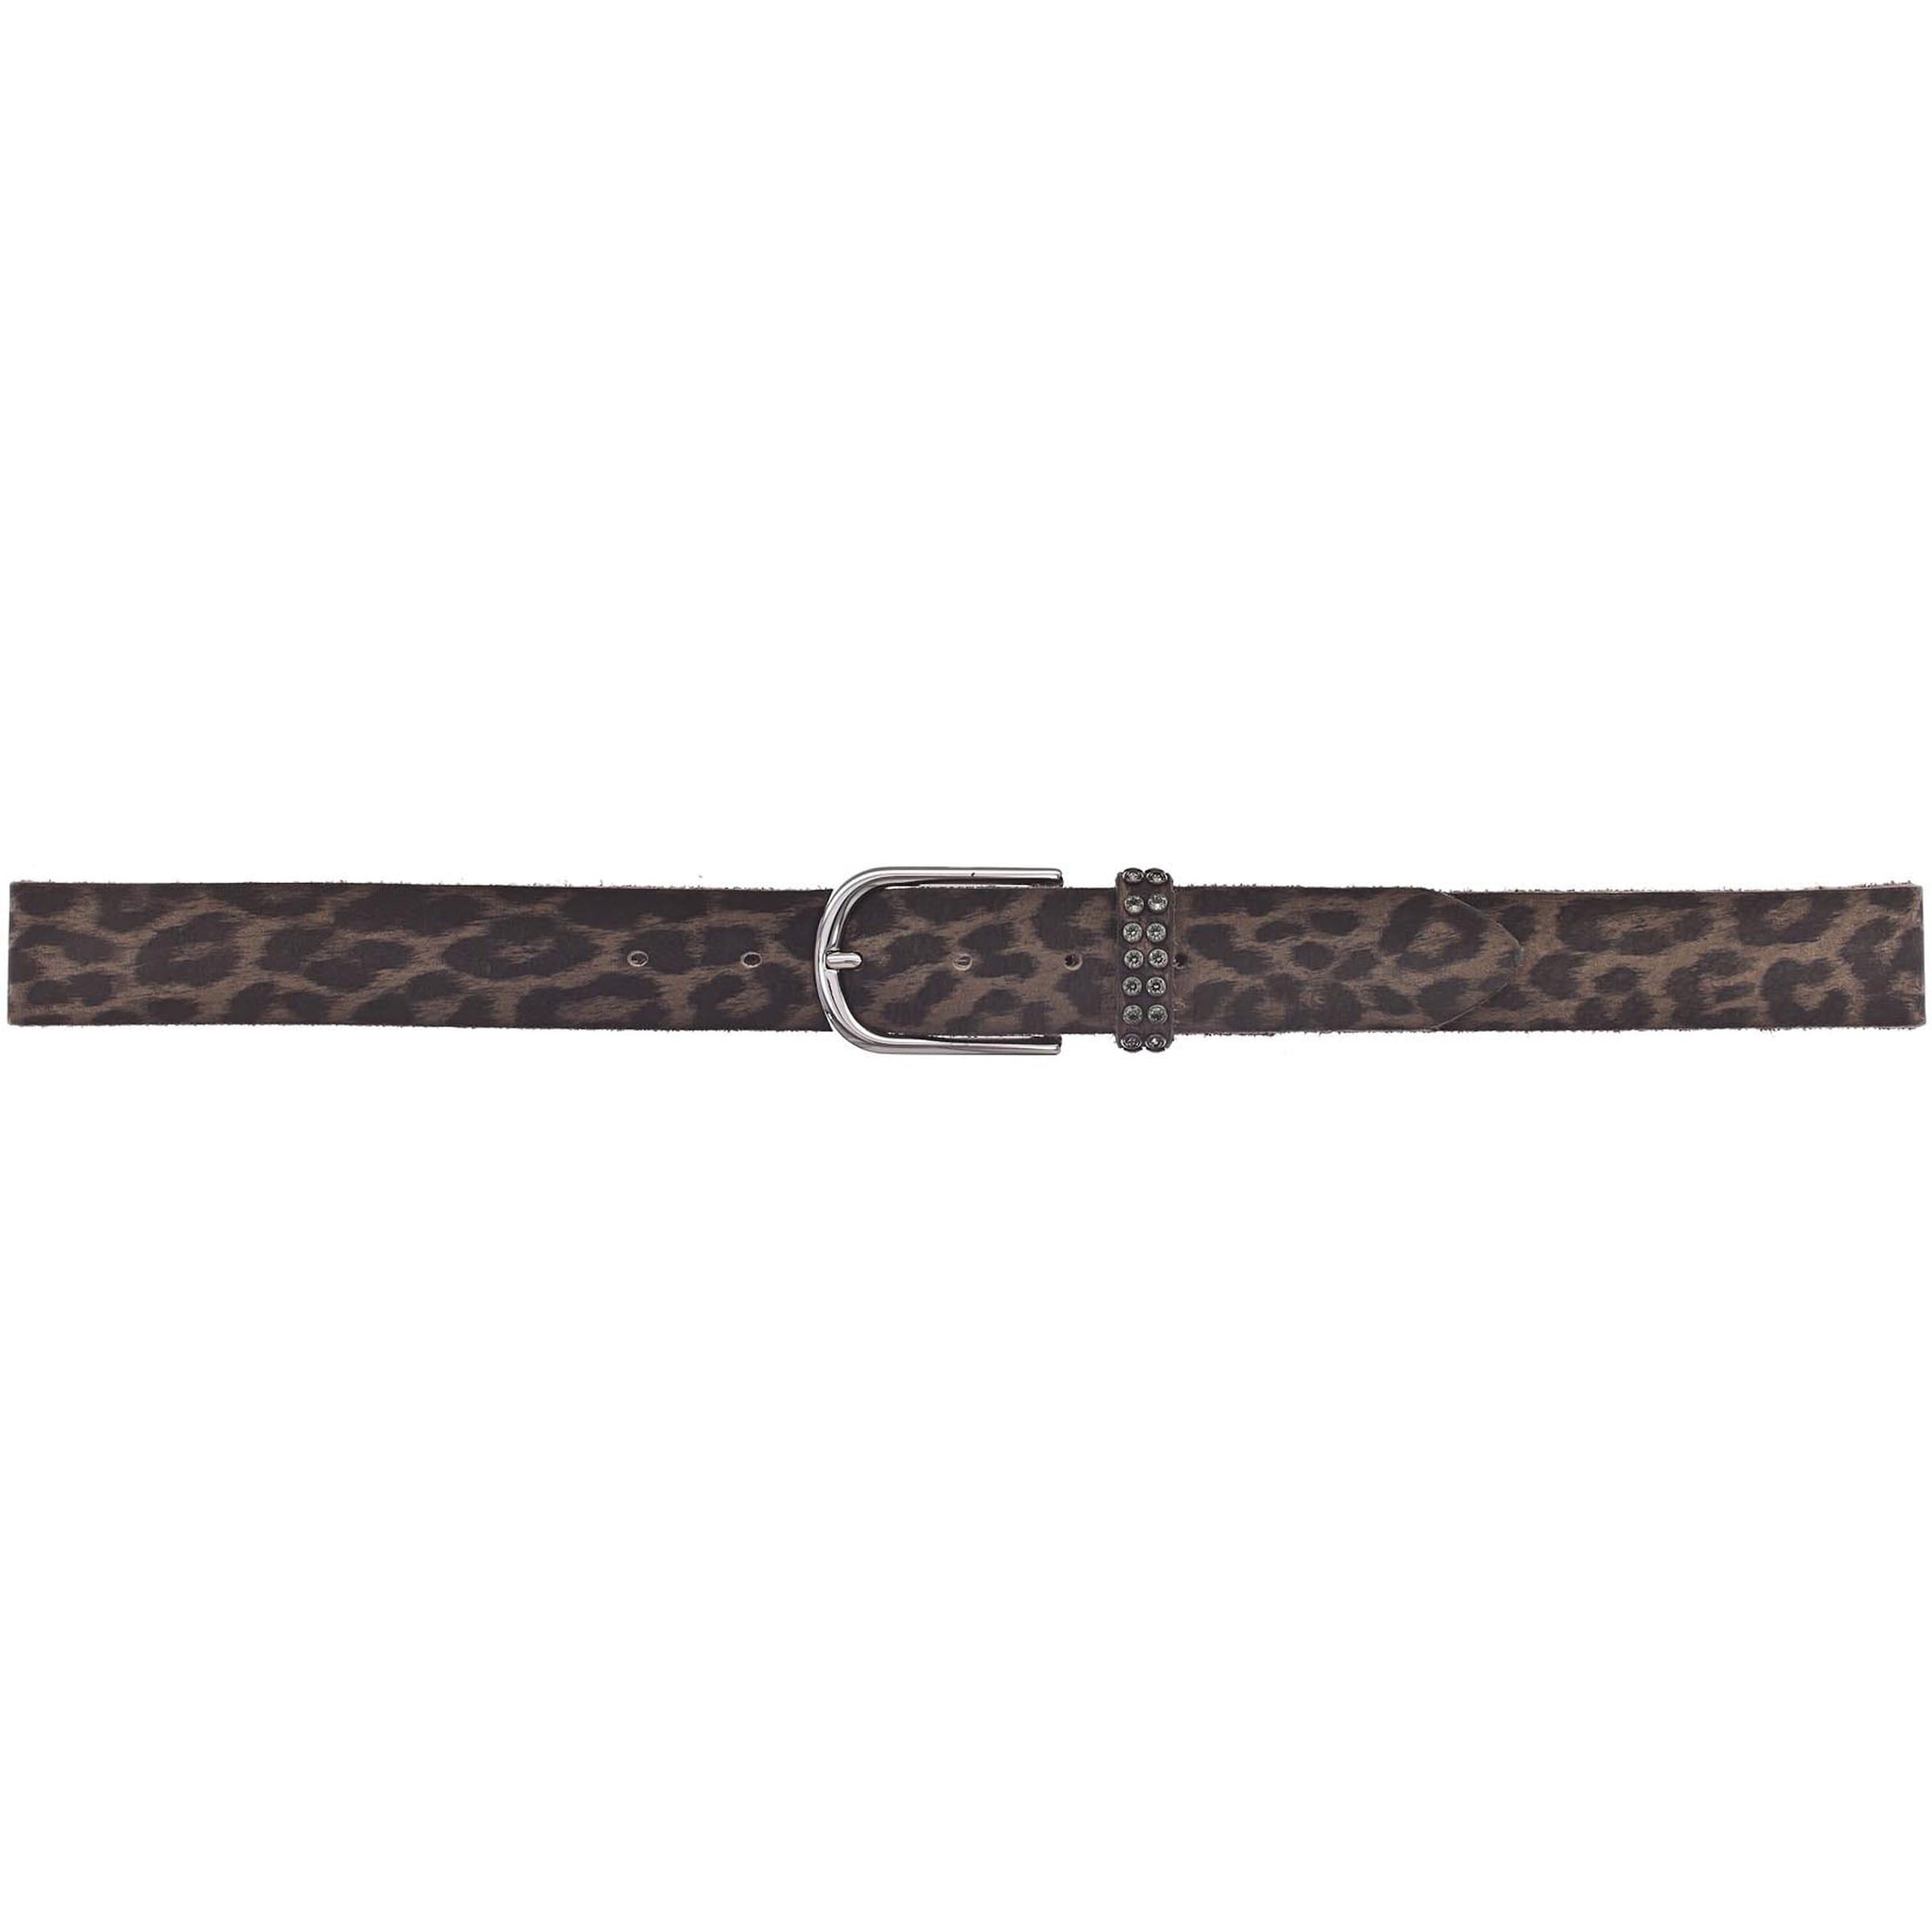 belt Handmade Riem 'leora' BruinZwart Germany In B 54Rq3LAj